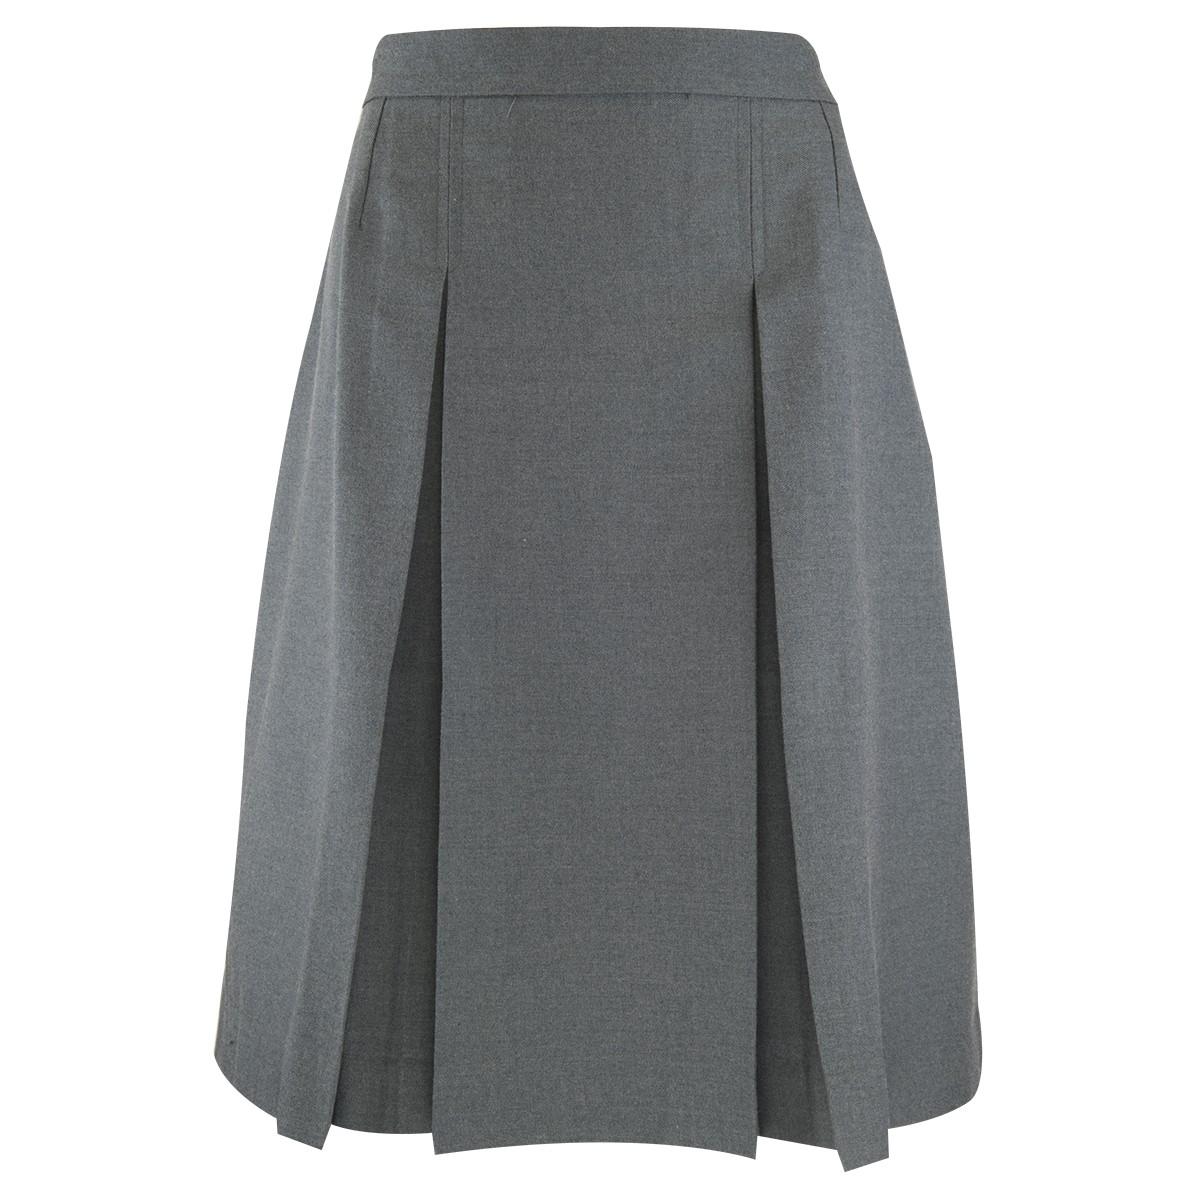 winter uniform girls plain skirt the school locker. Black Bedroom Furniture Sets. Home Design Ideas